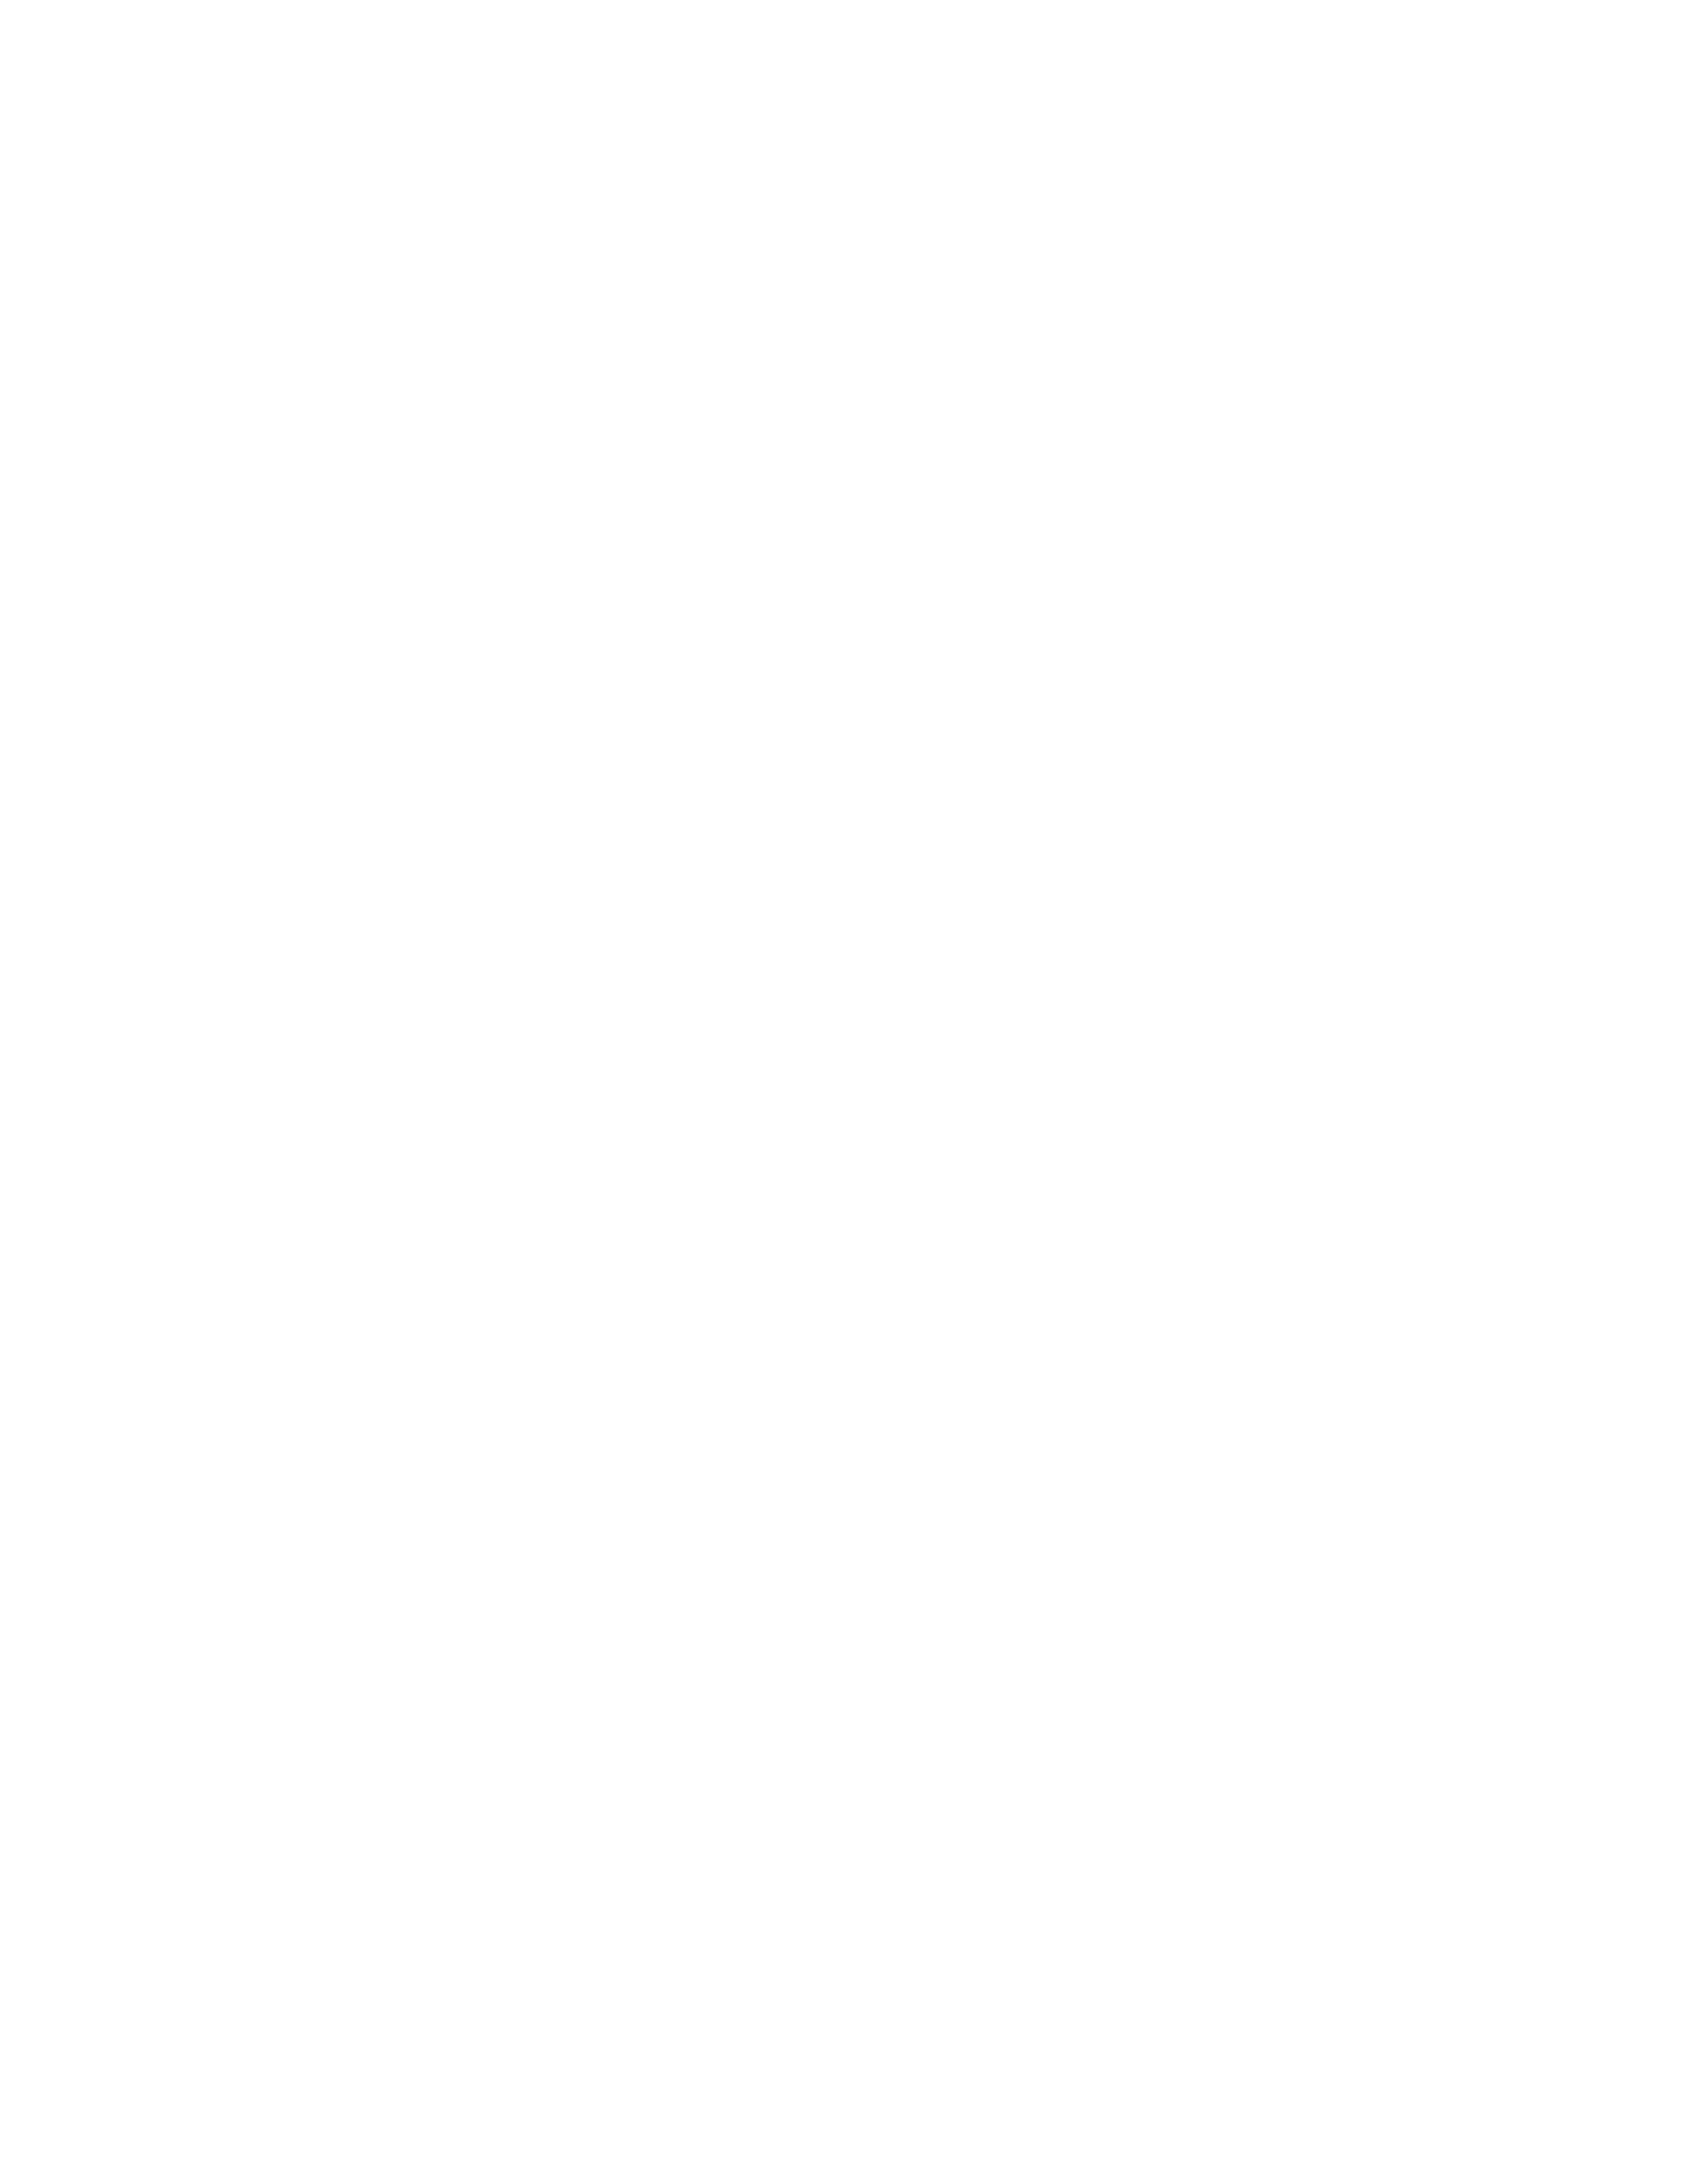 Name der Organisation